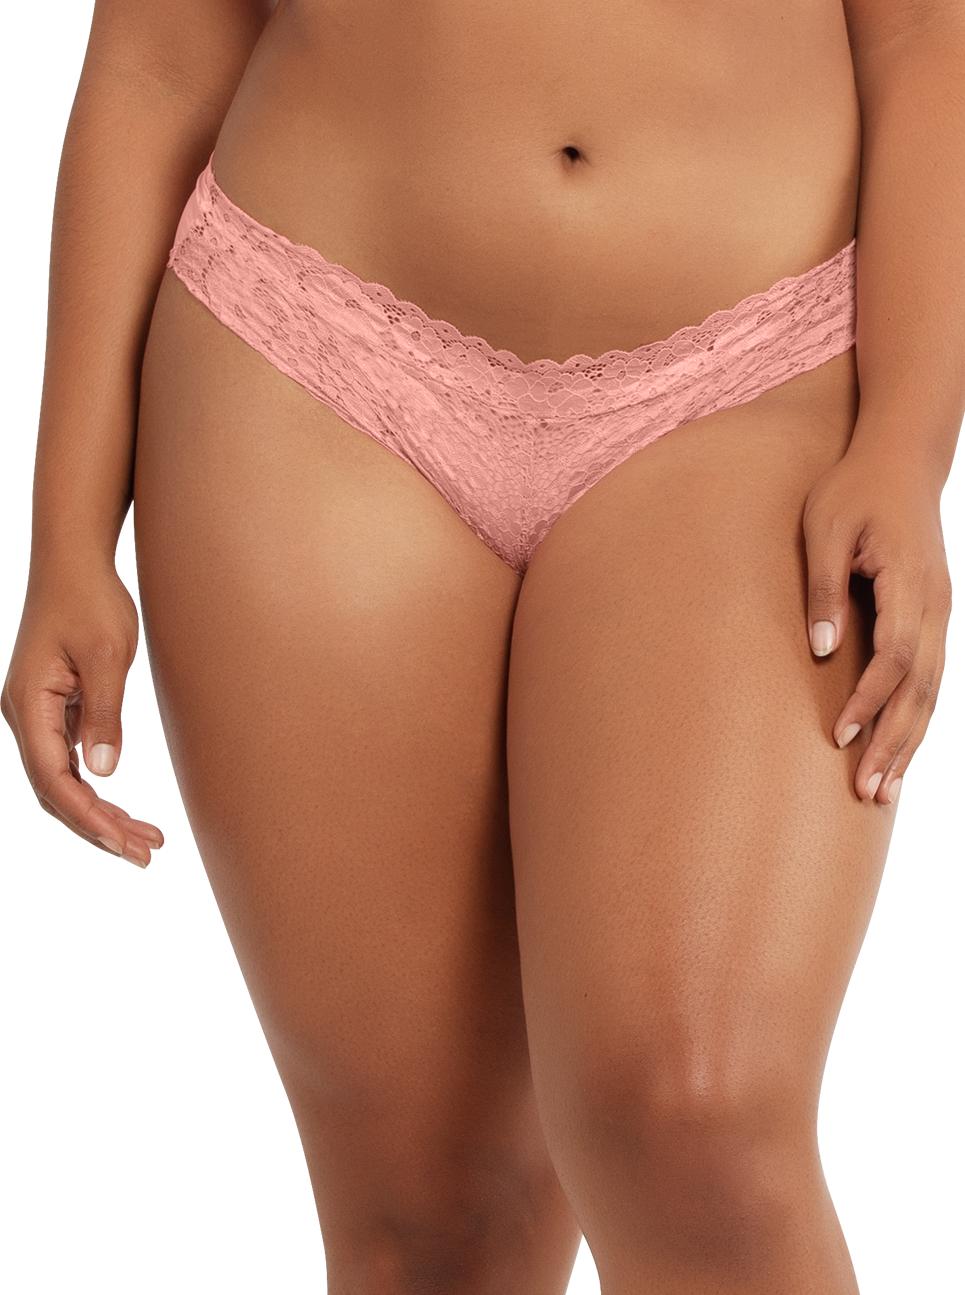 PARFAIT Adriana BikiniP5483 PeachBud Front - Adriana Bikini - Peach Bud - P5483